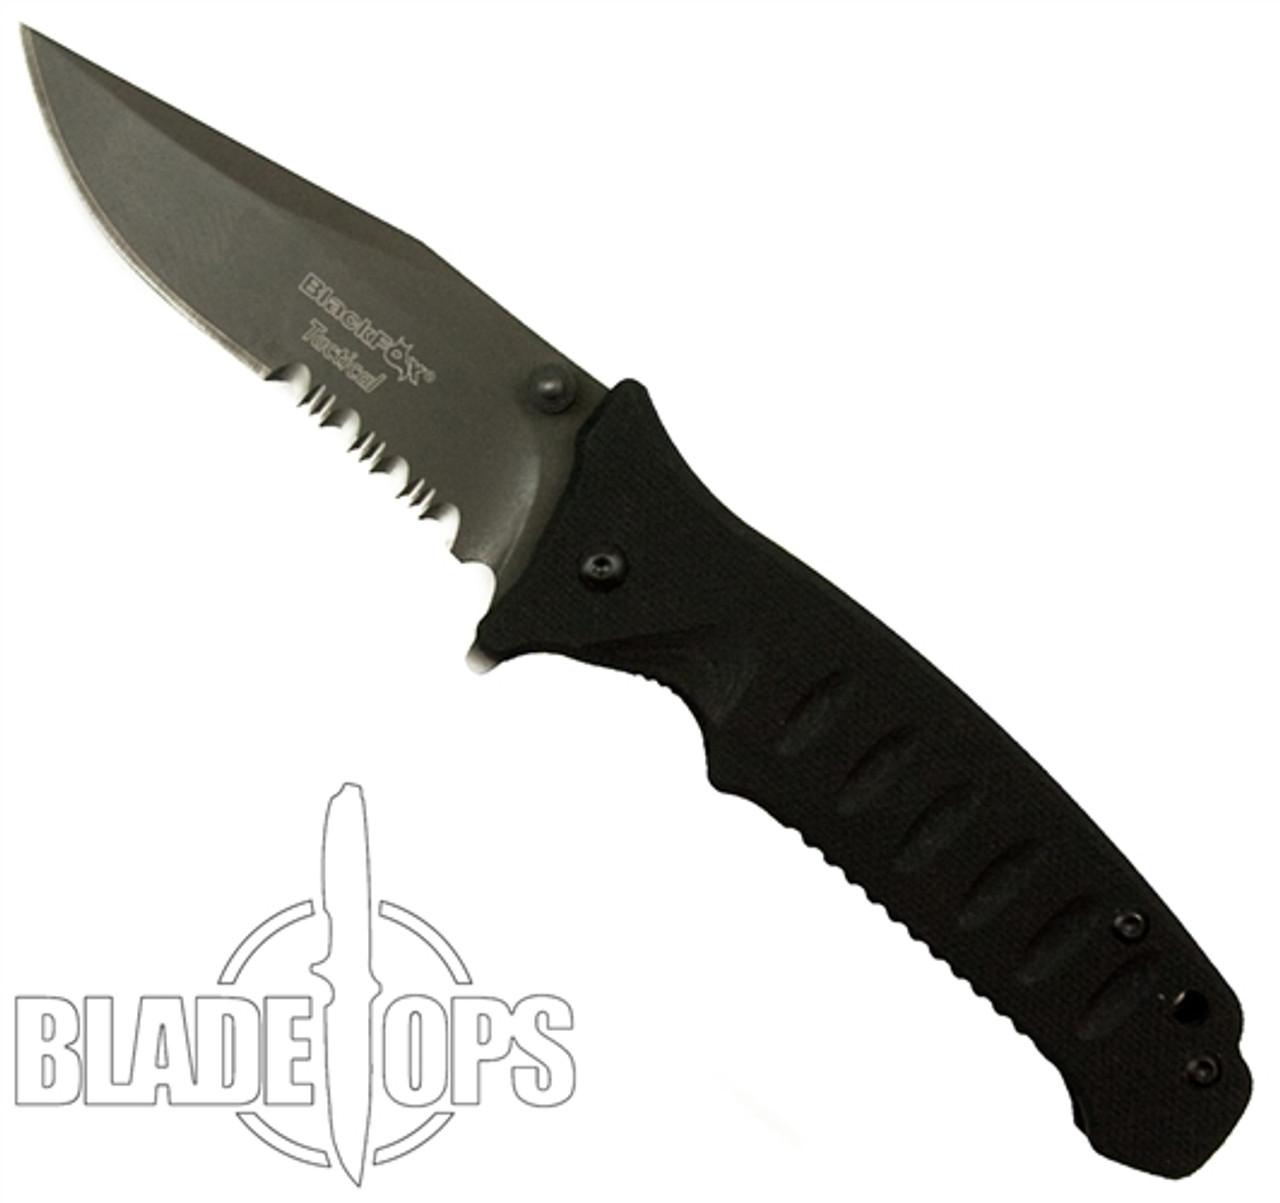 Black Fox Knives Clip Point Assist Knife, Black Combo Blade